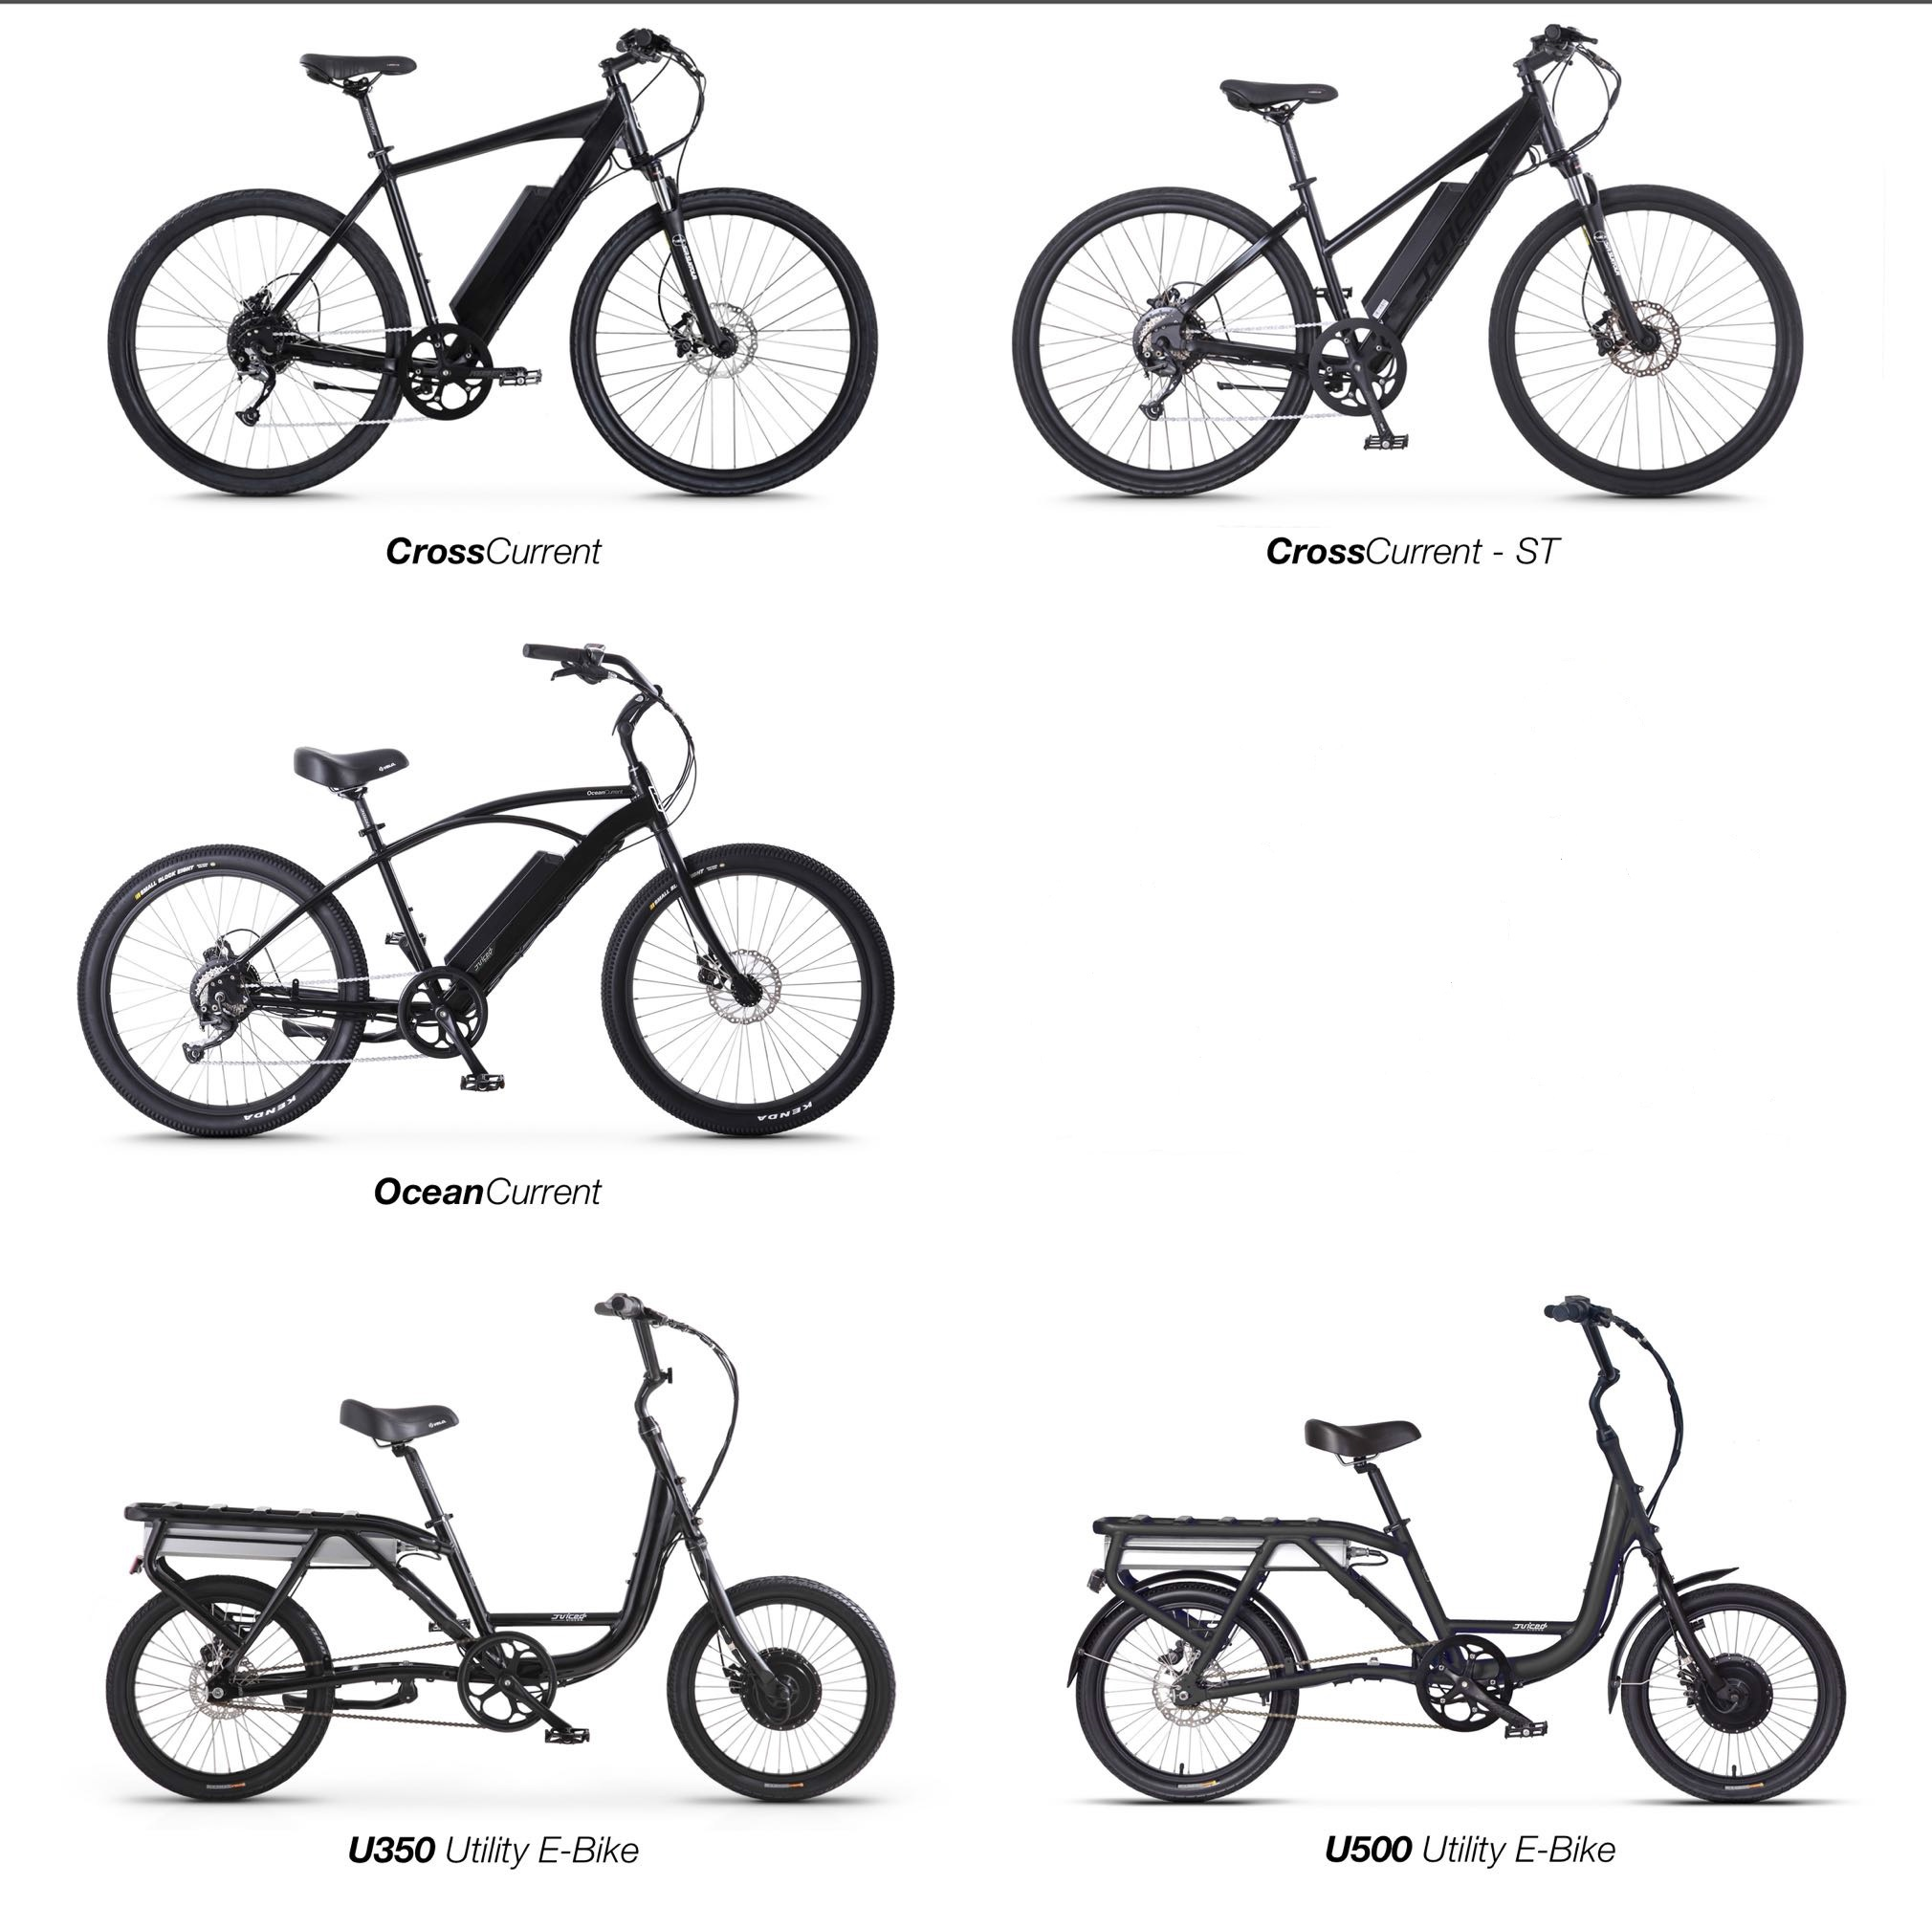 interbike-2016-new-bikes-edit.jpg